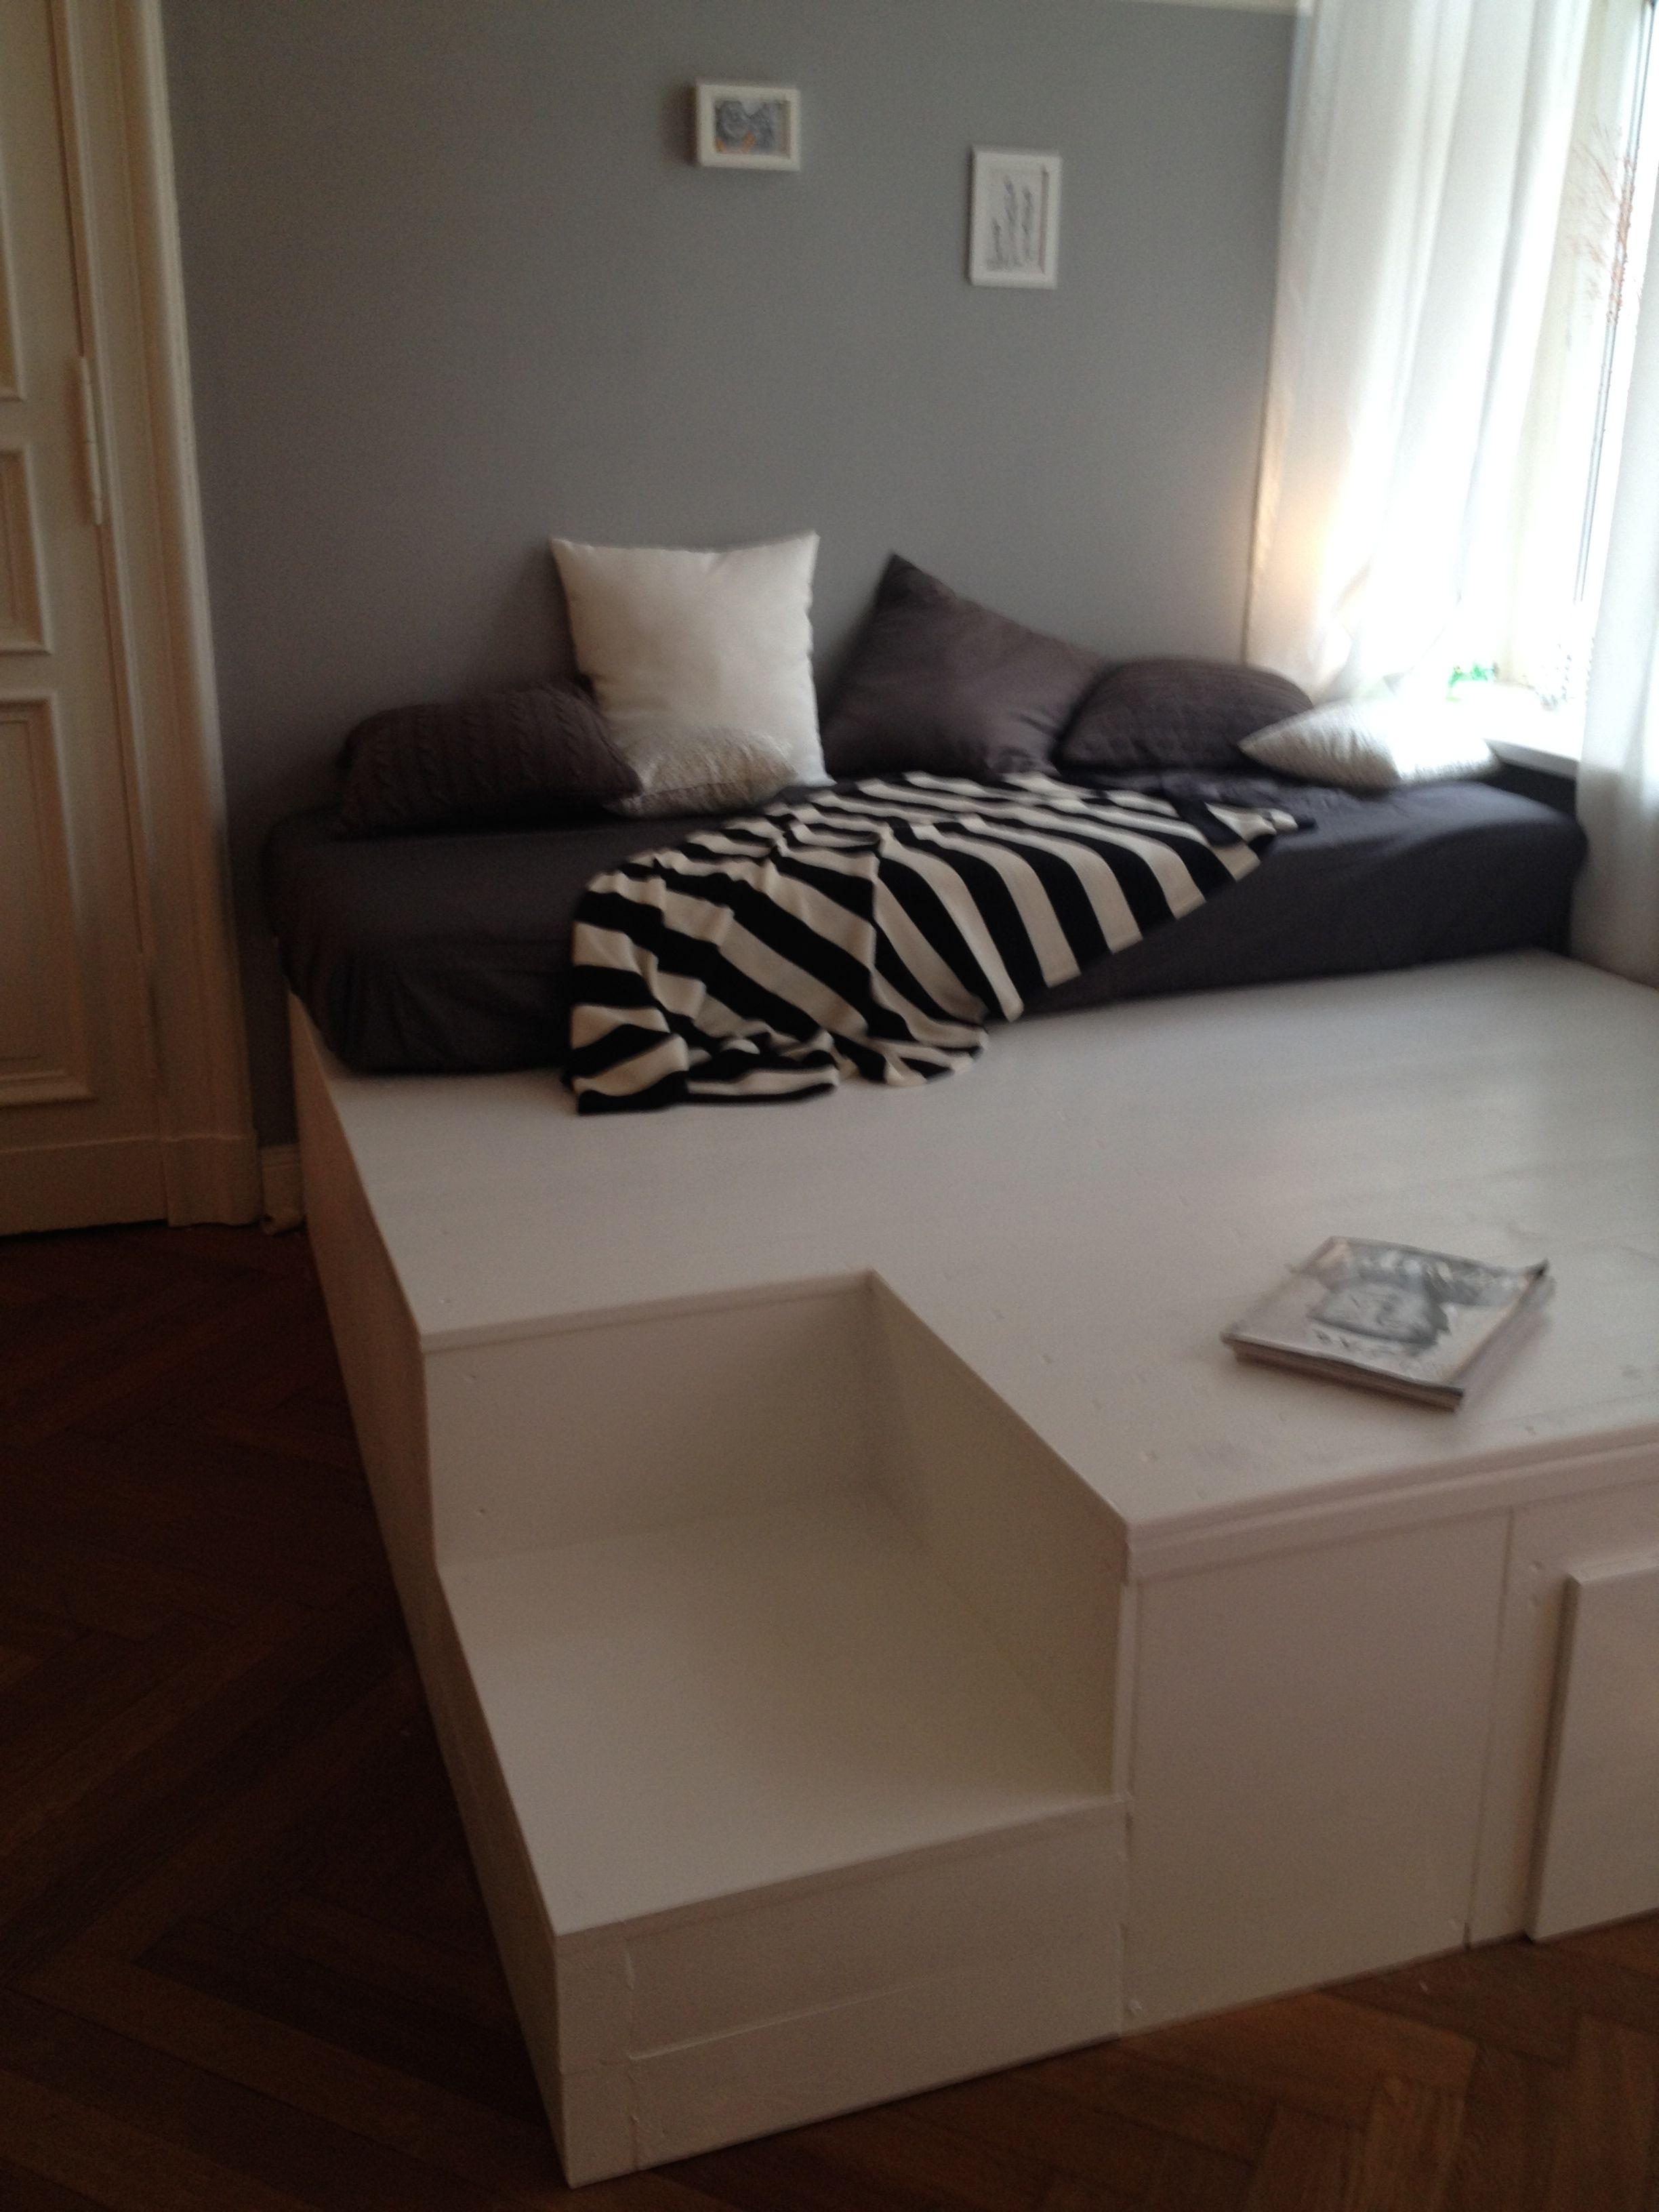 diy podest my home pinterest podest bett und betten. Black Bedroom Furniture Sets. Home Design Ideas